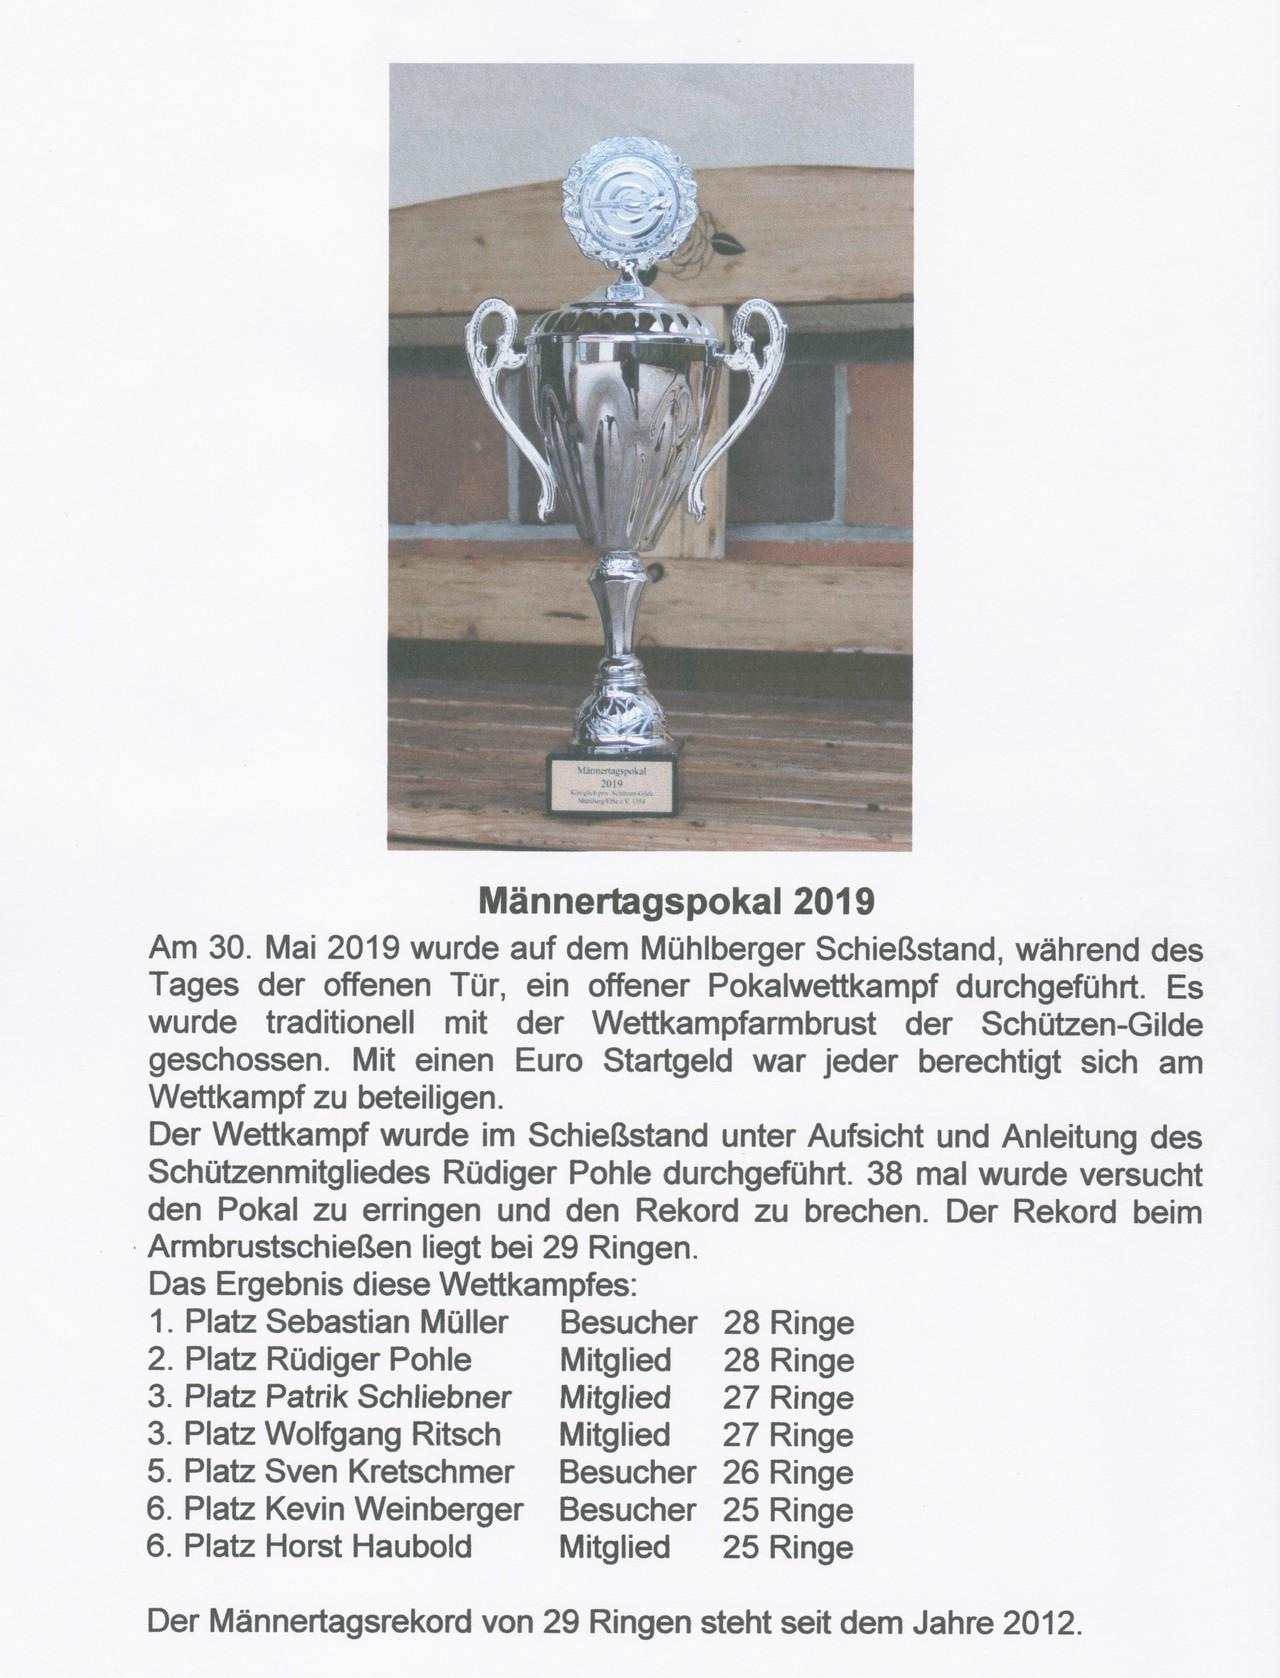 2019 Männertagspokal